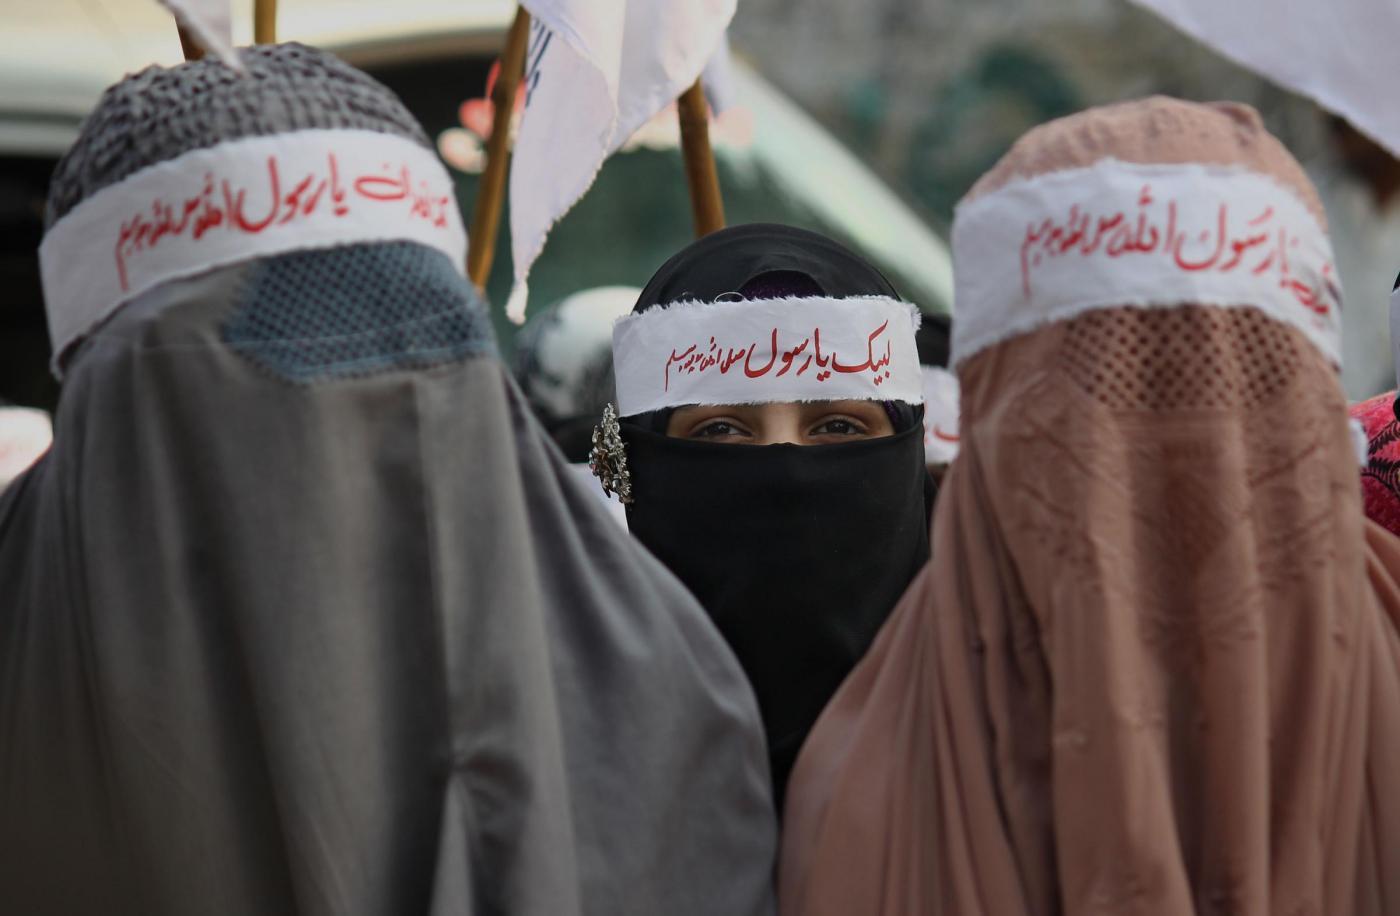 L'Isis vieta il burqa a Mosul per motivi di sicurezza